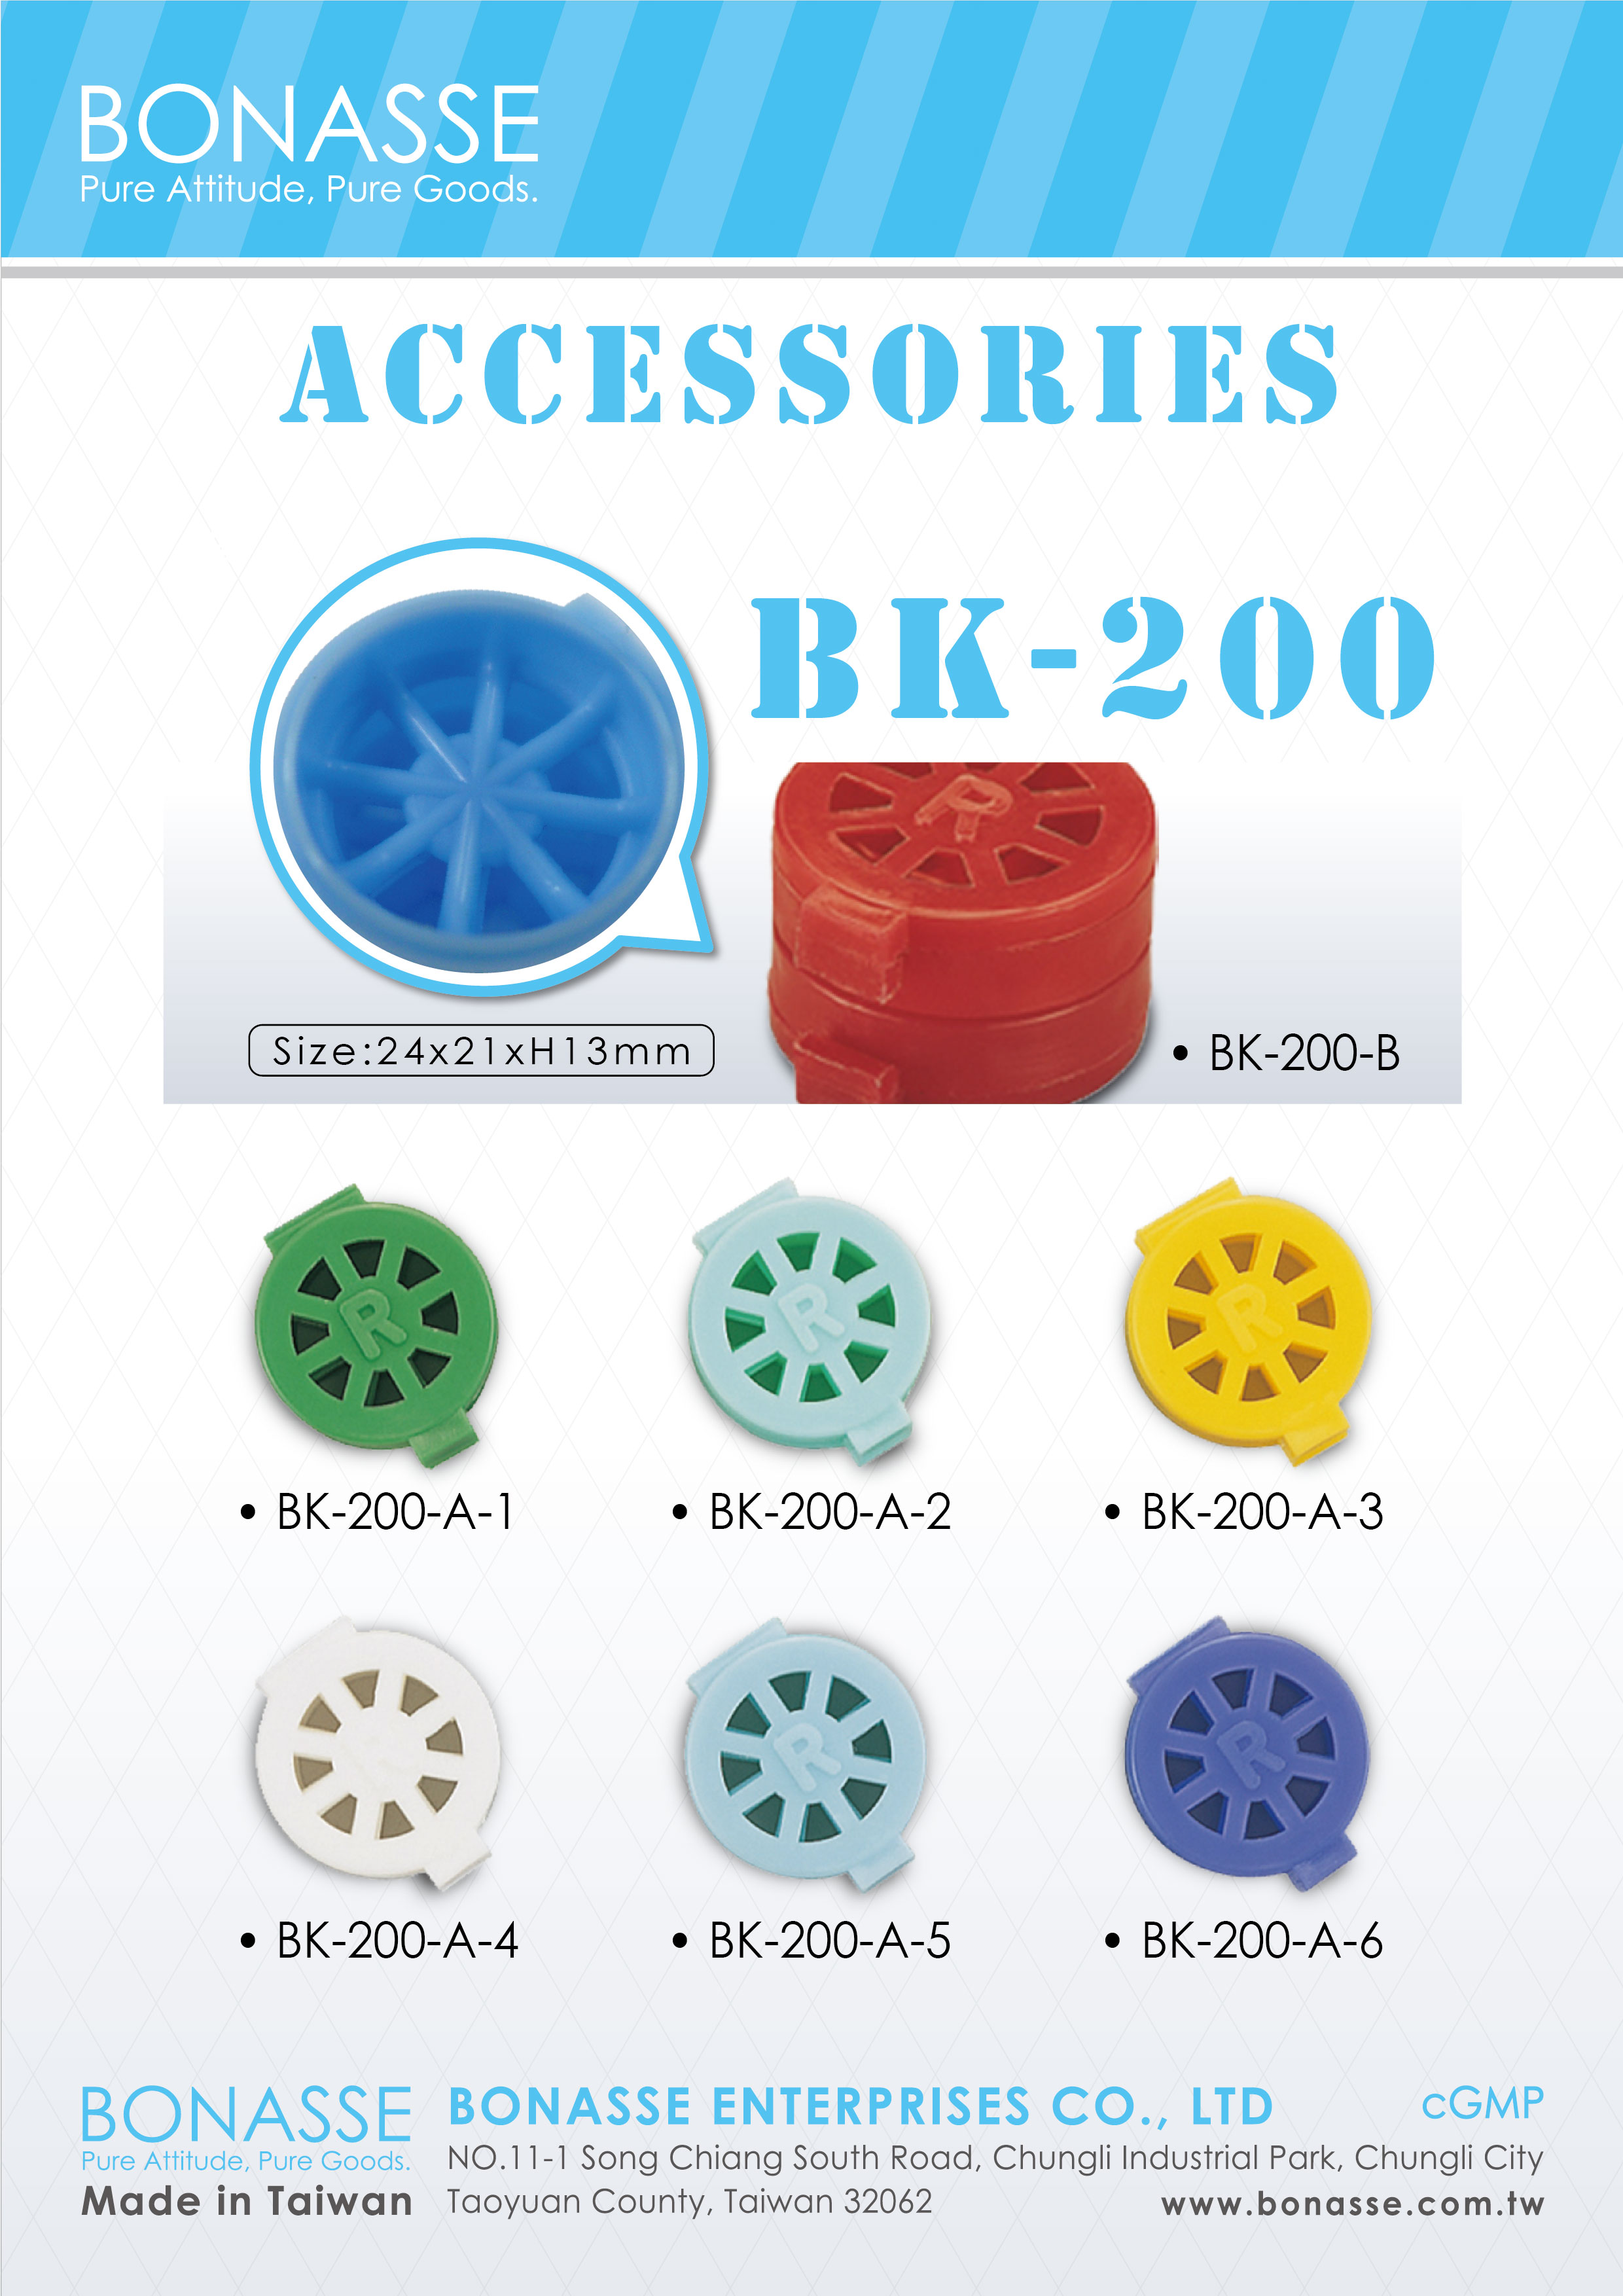 BK-200